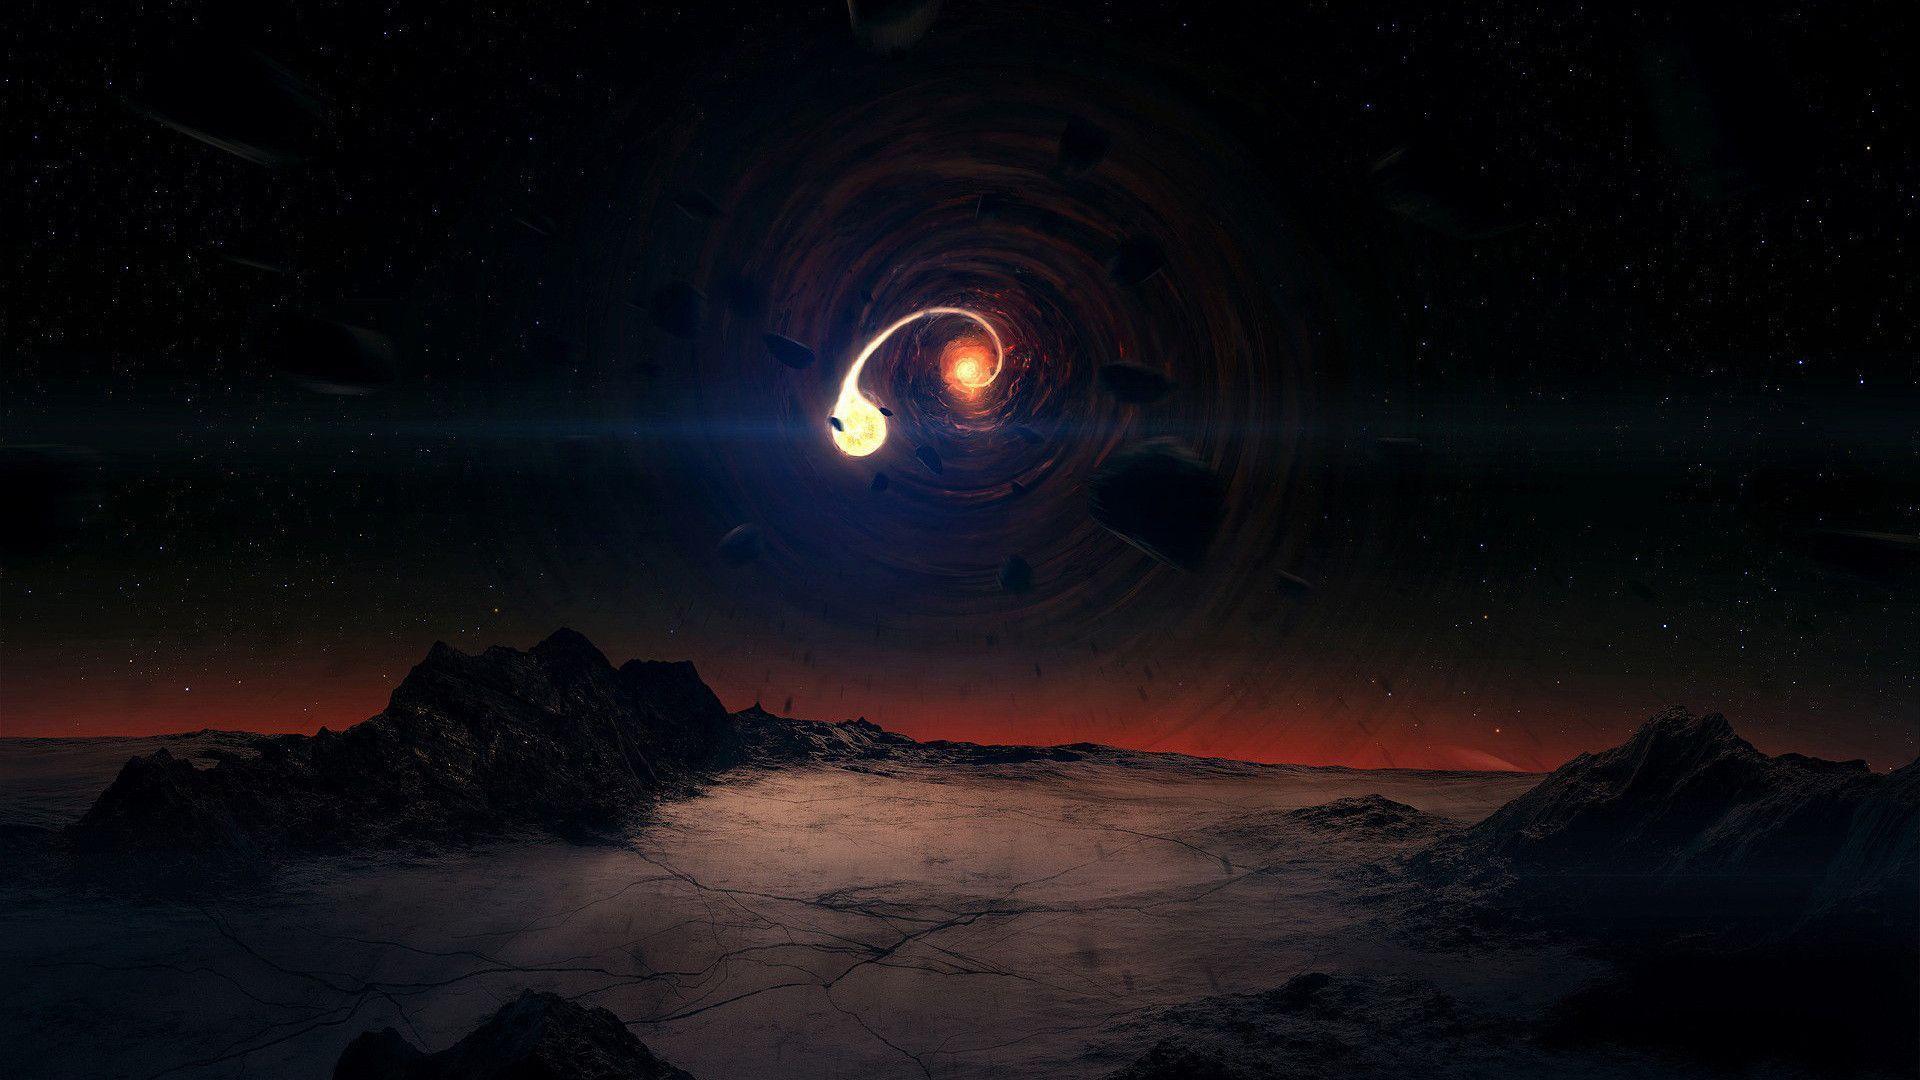 Black Hole Backgrounds Wallpaper Cave